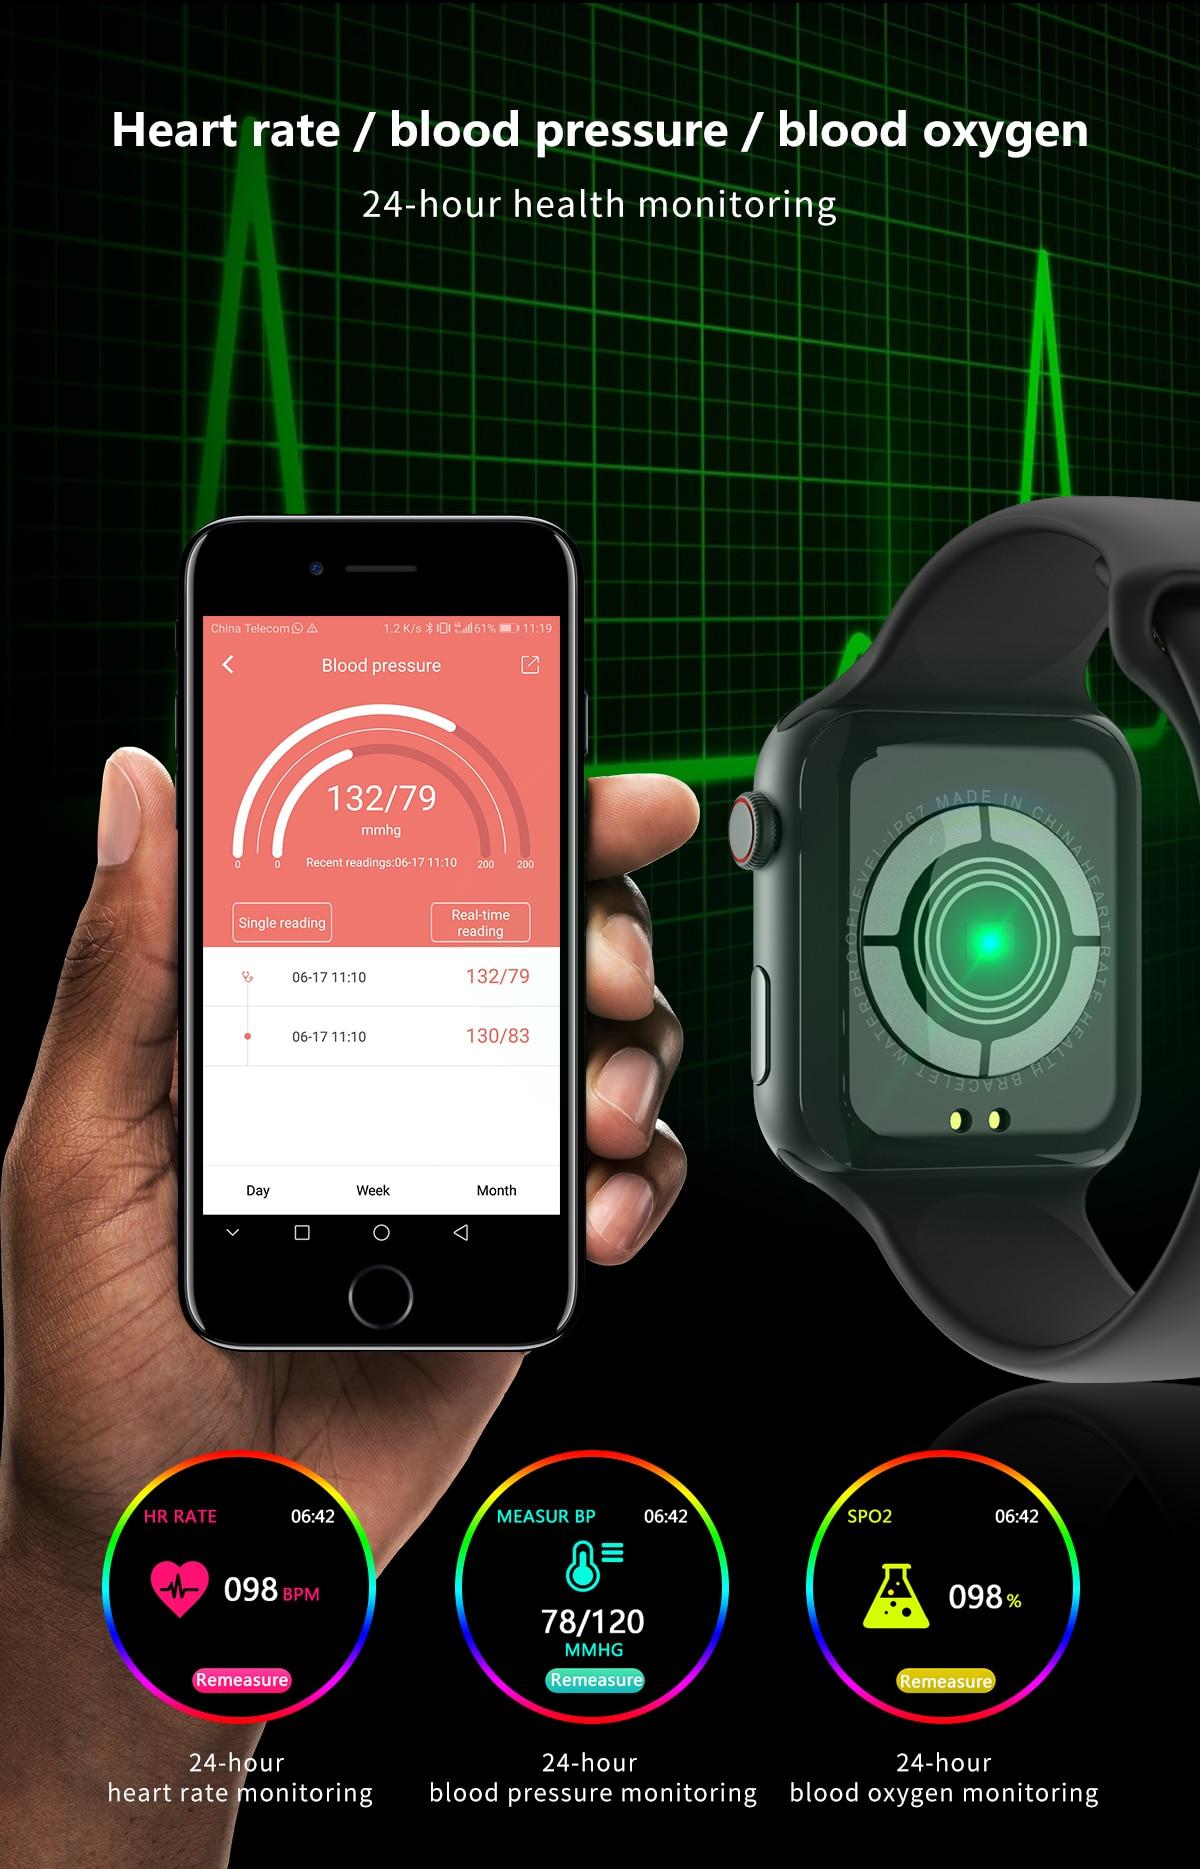 H8ce9ed65d53f4aac98eb469673bce0a66 696 New Style F10 Smart Watch Full touch screen Bluetooth Smartwatch Music Camera Heart Rate Monitor Waterproof Smart Bracelet